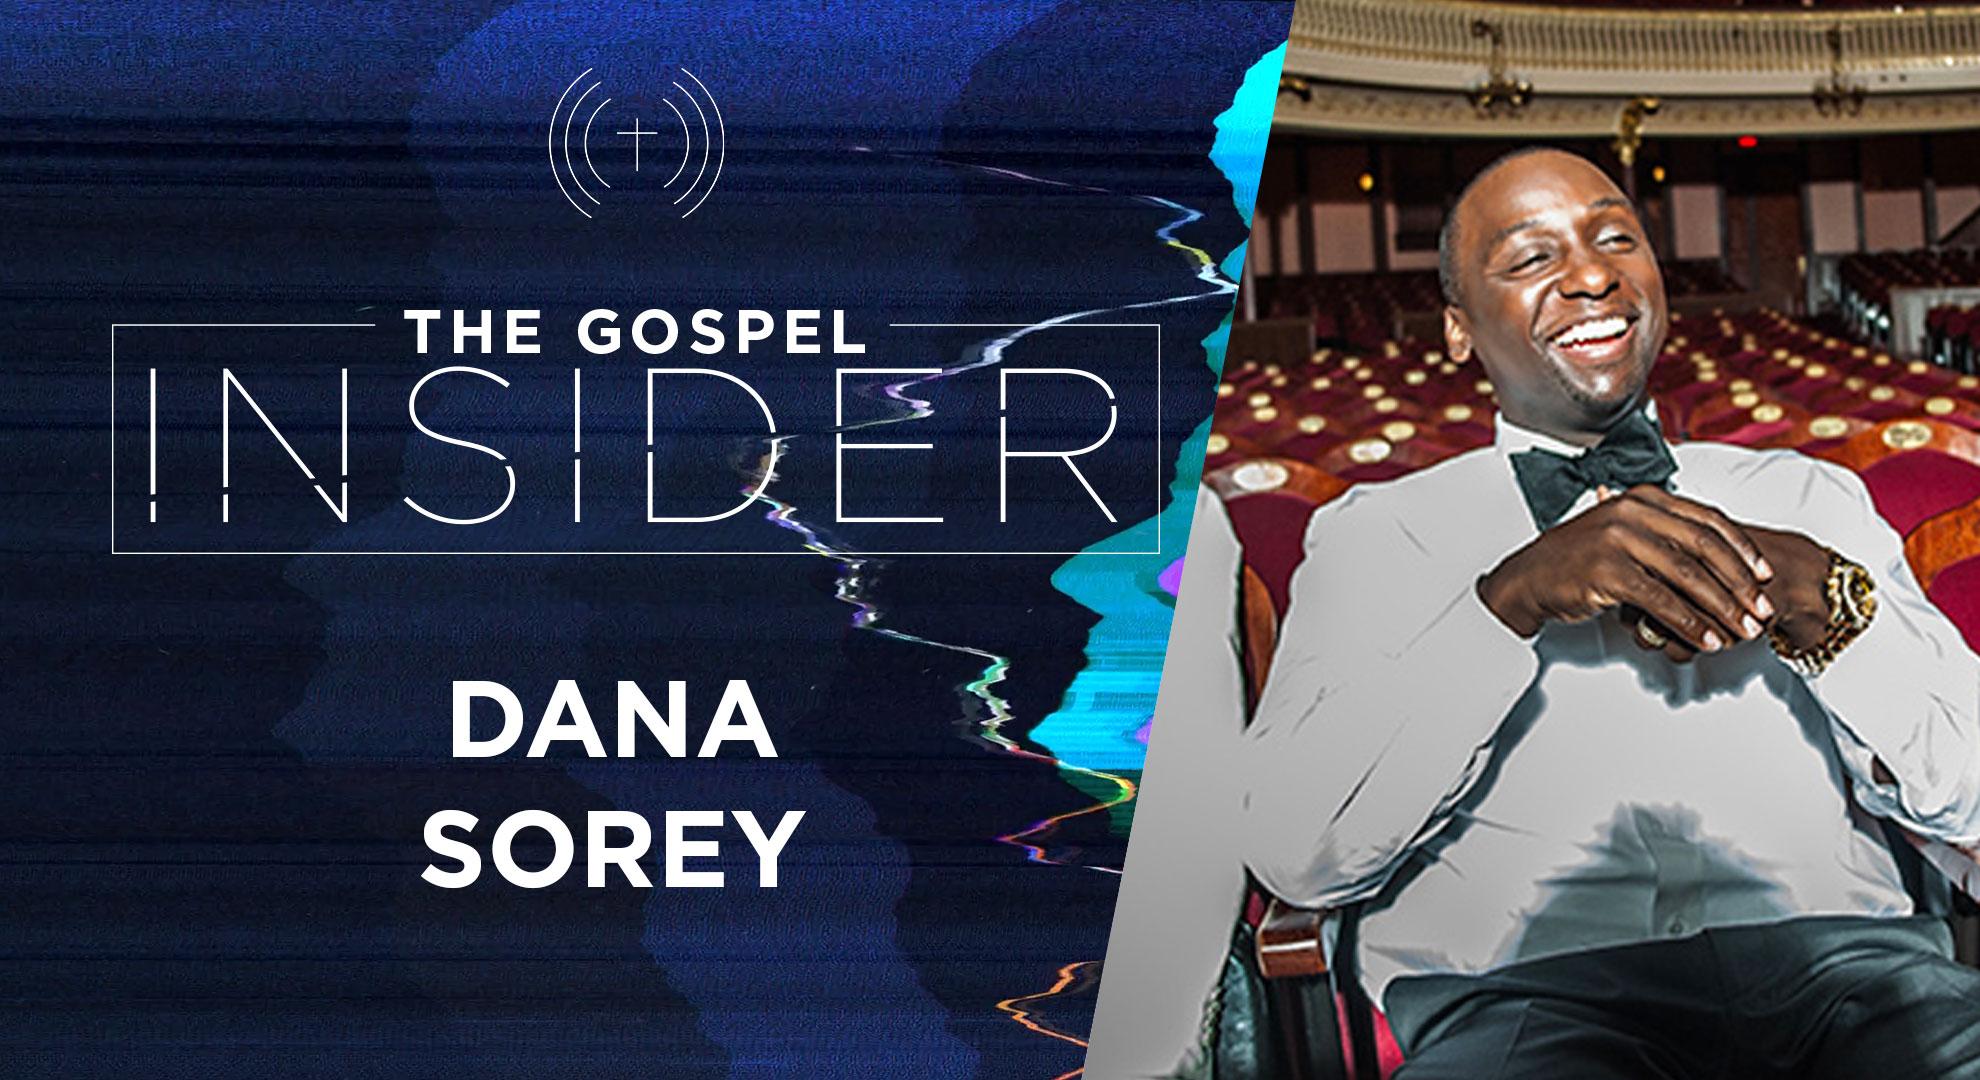 The Gospel Insider – Dana Sorey